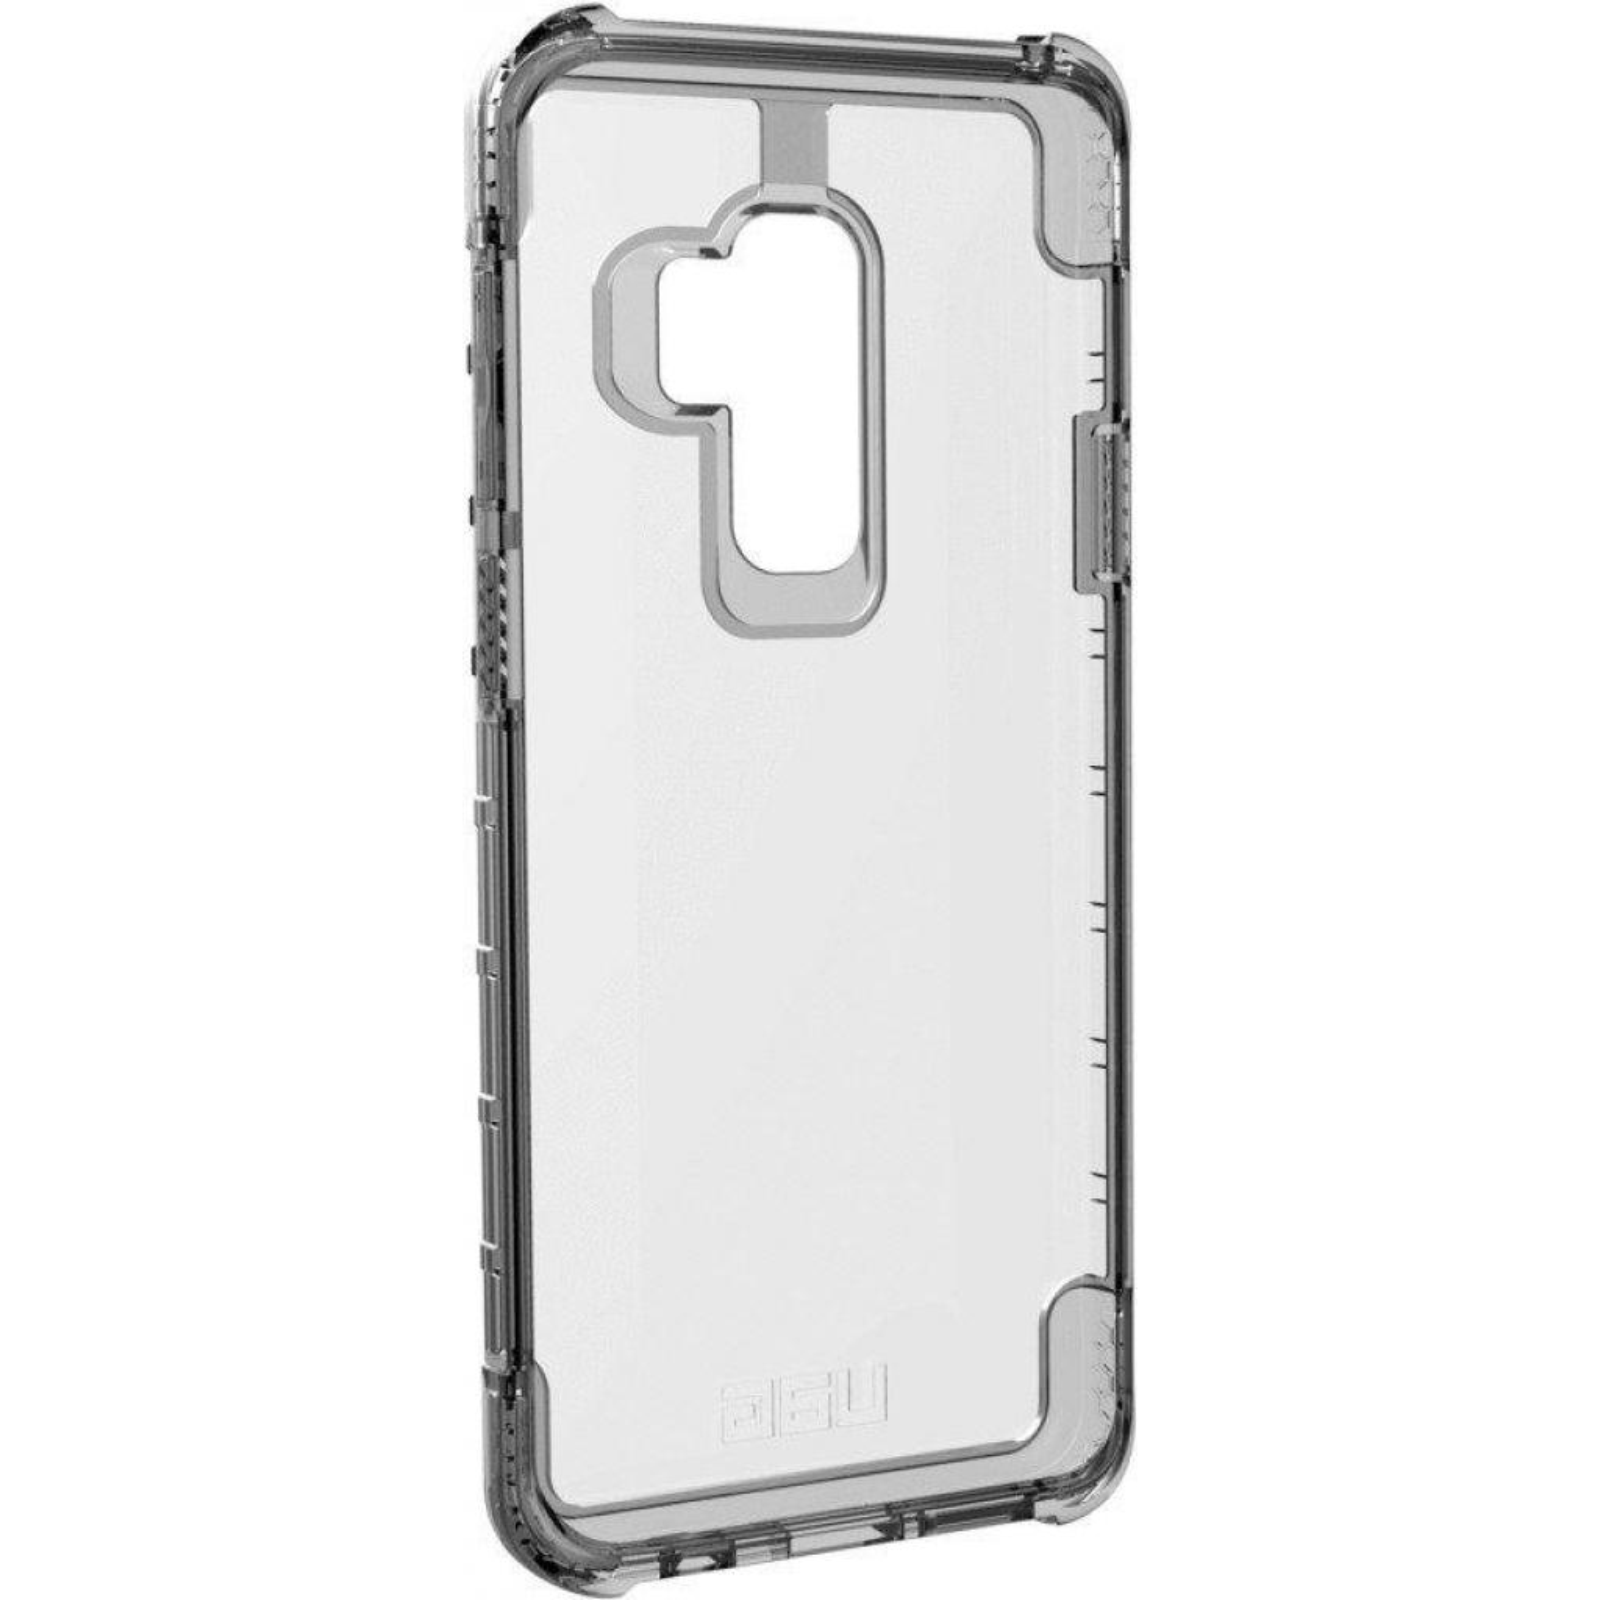 Чехол для моб. телефона UAG Galaxy S9+ Plyo Ice (GLXS9PLS-Y-IC) изображение 2